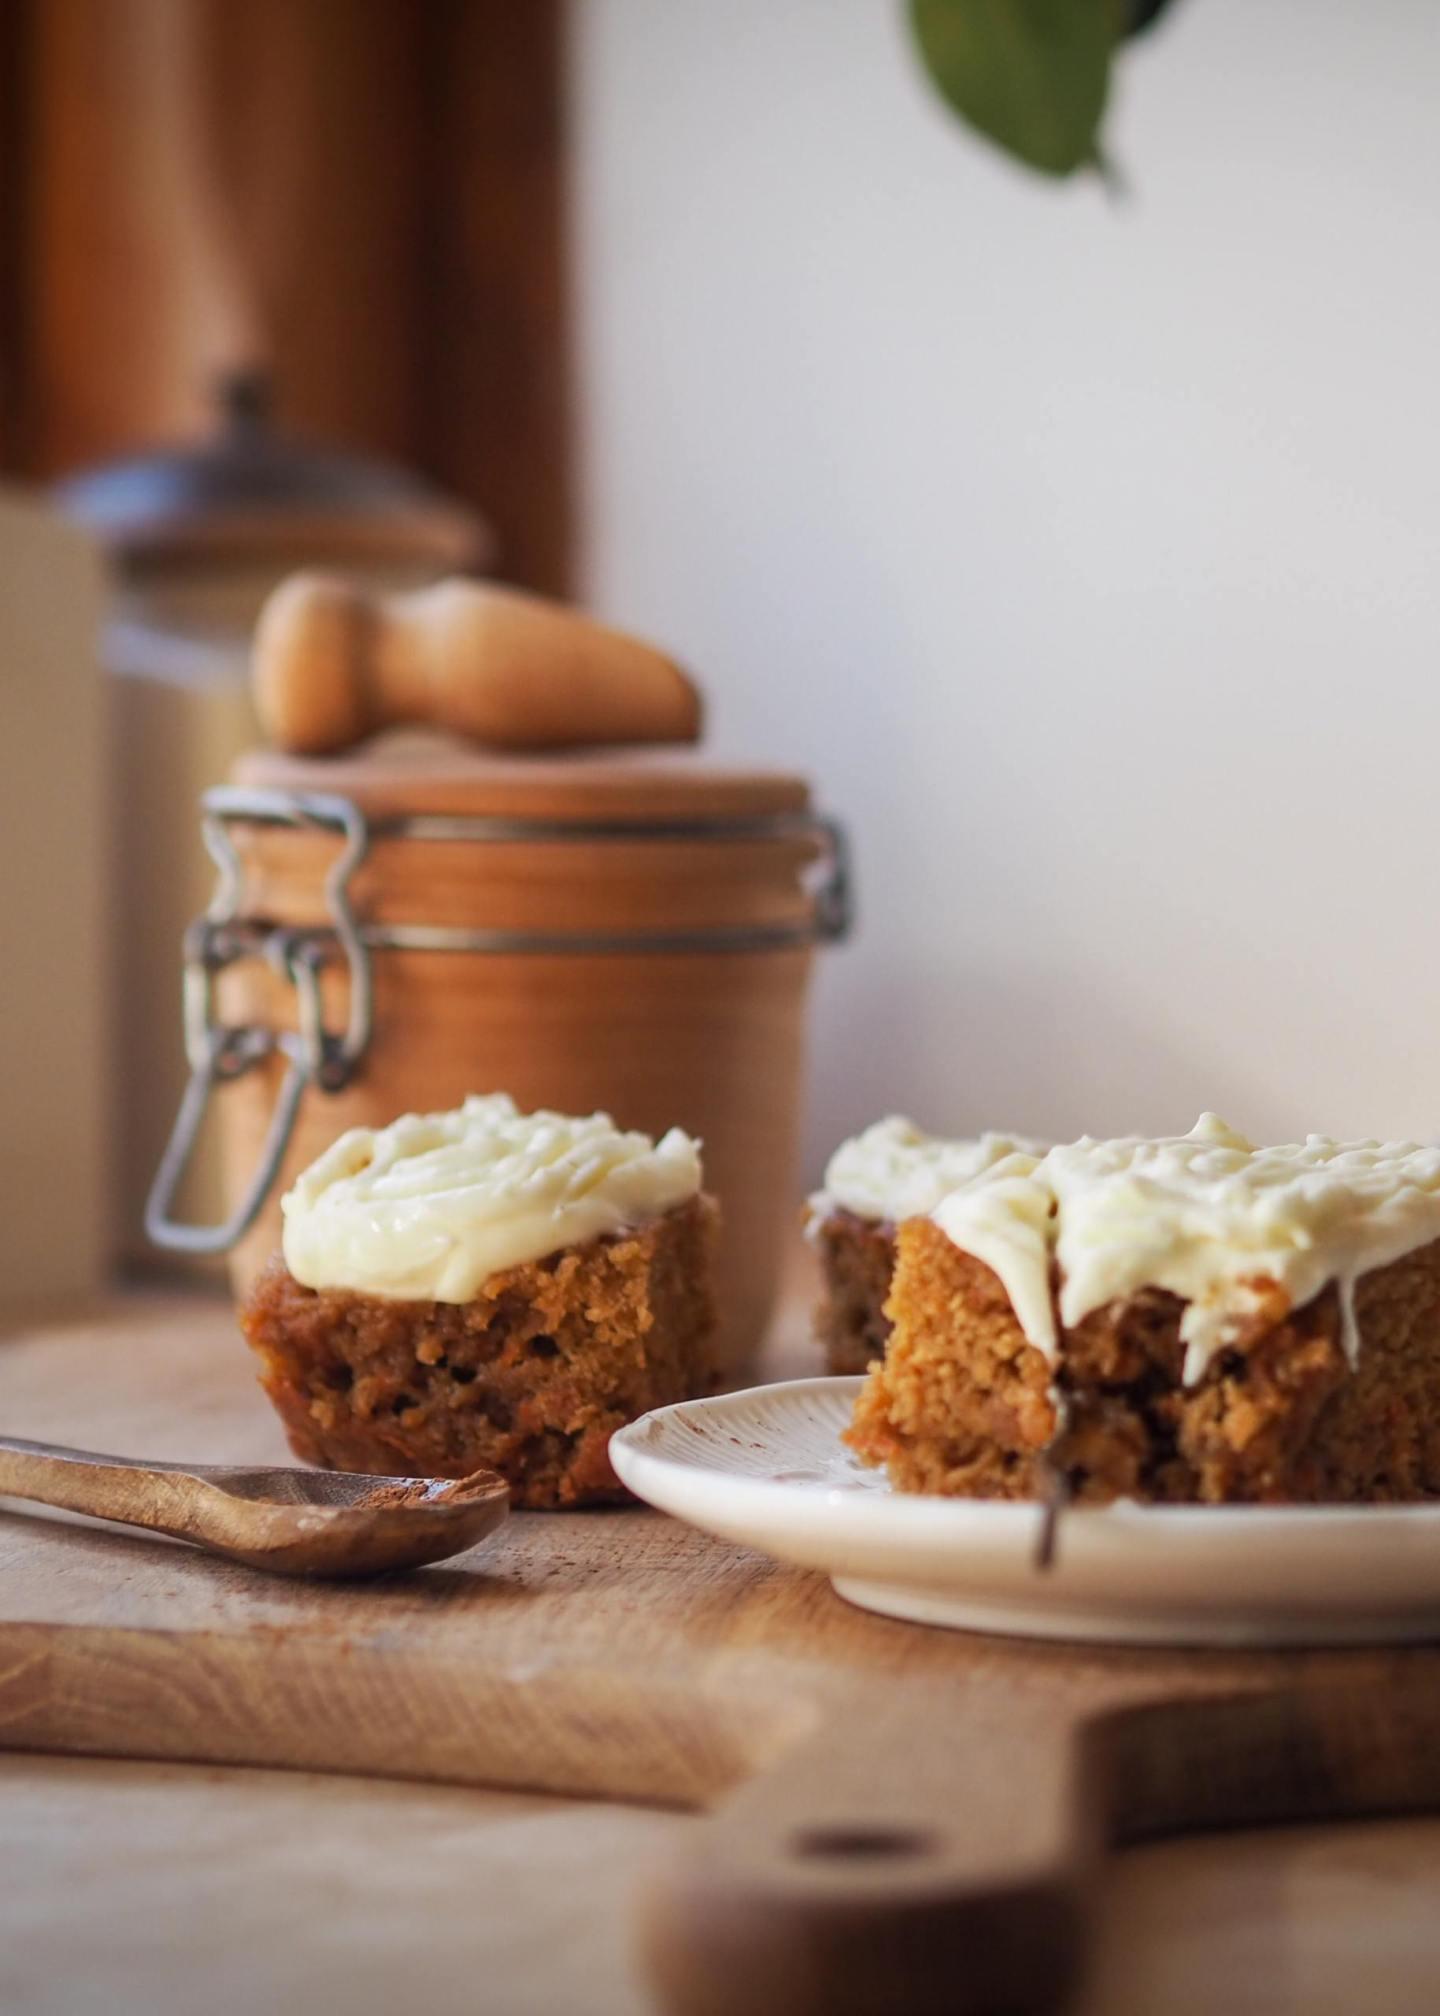 Carrot cake recipe uk